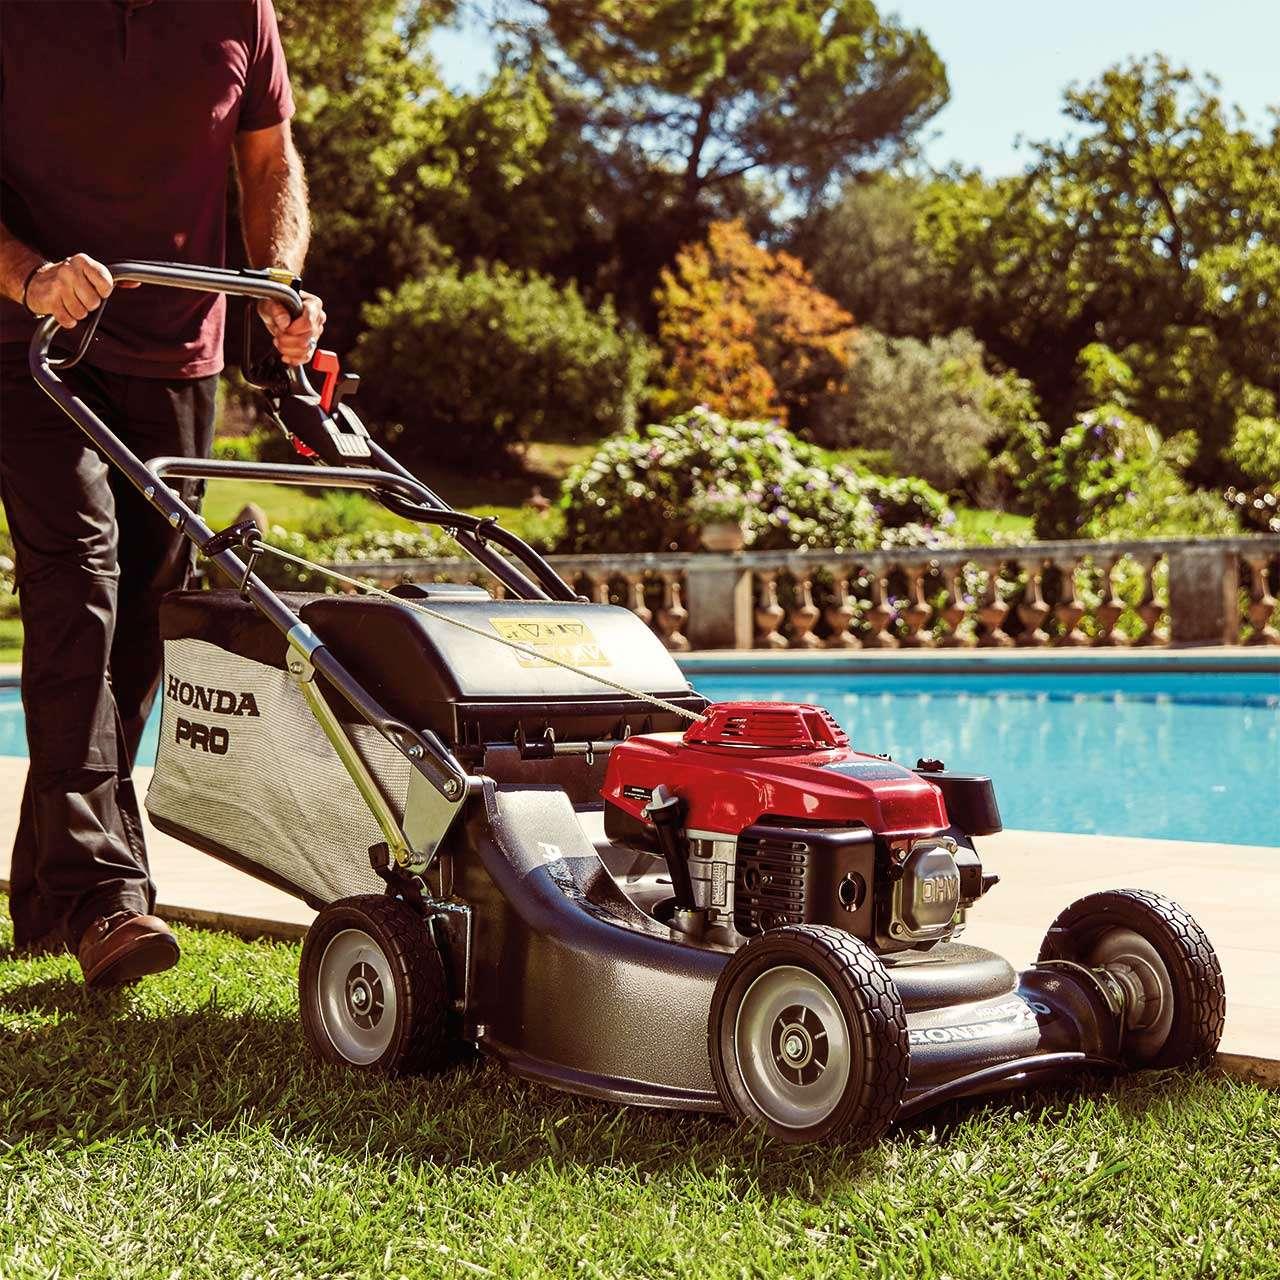 Overview | HRH | Lawnmowers | Lawn & Garden | Honda